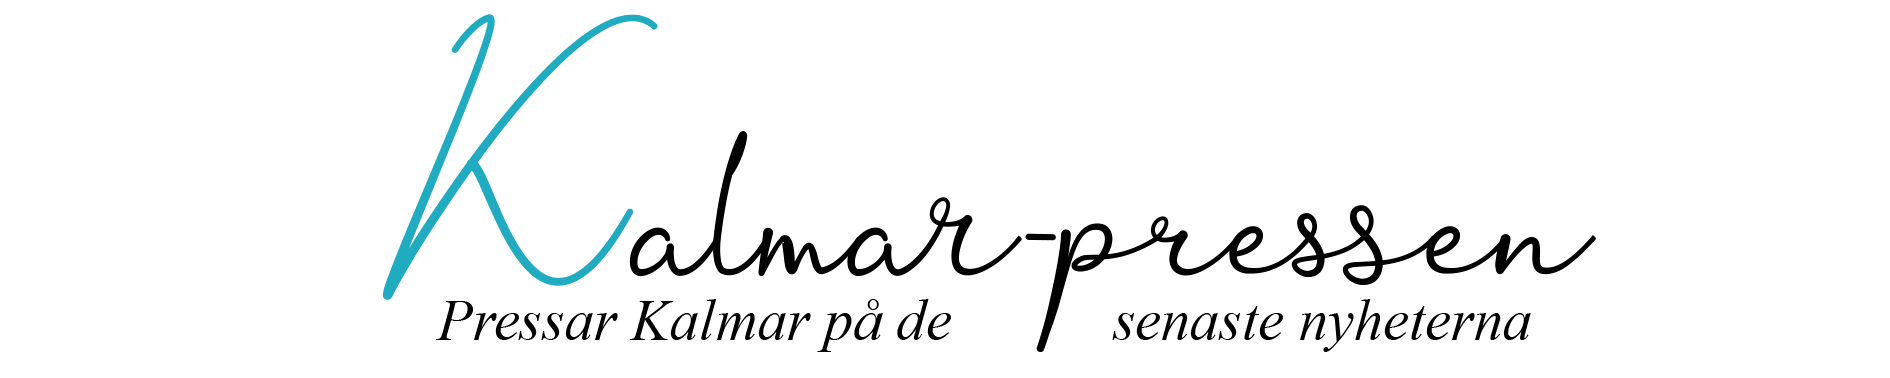 Kalmar-Pressen